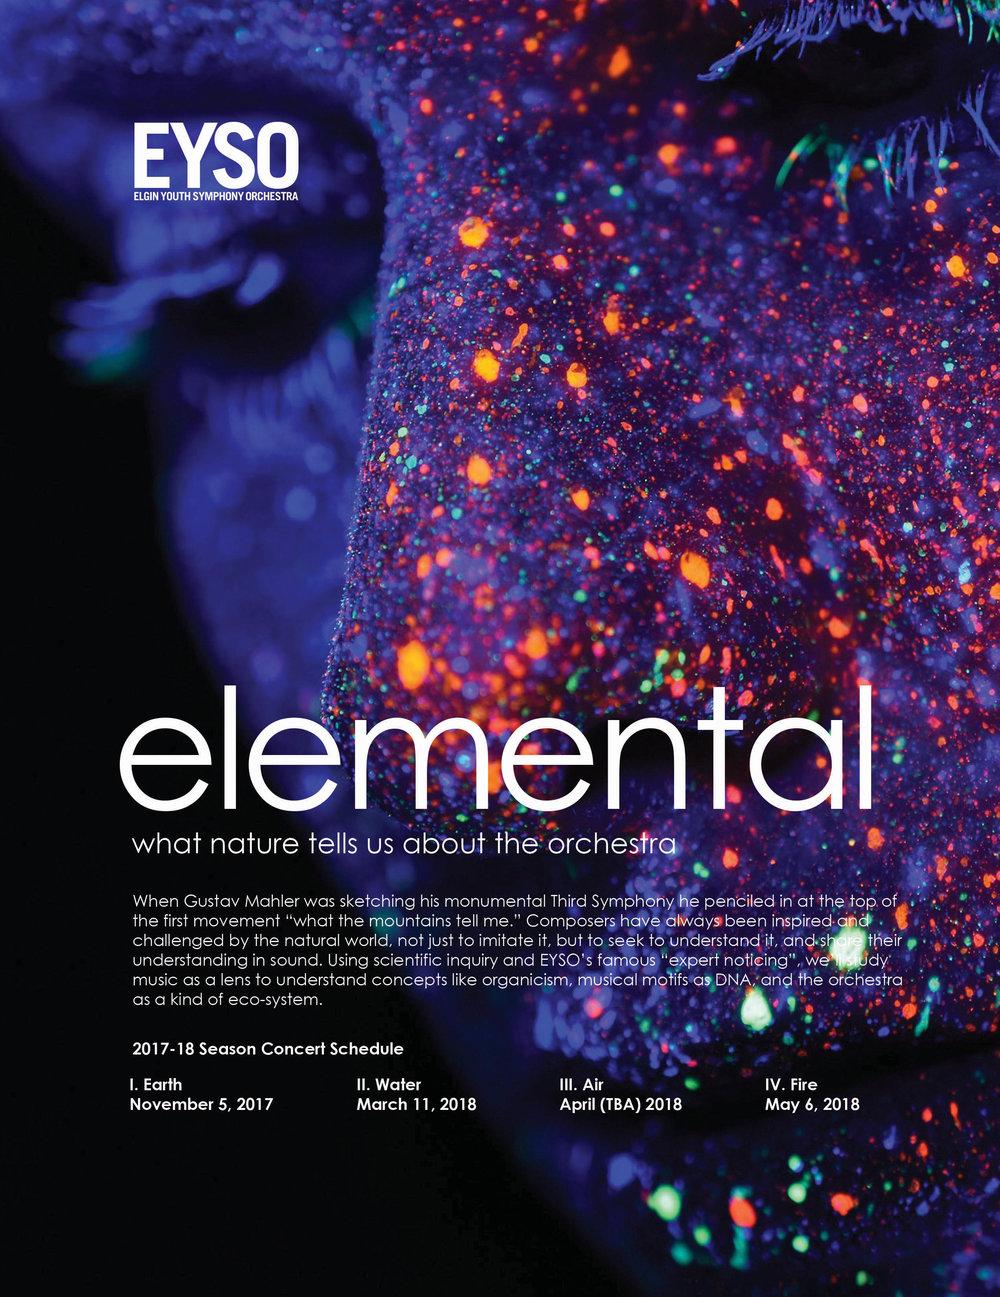 ElementIdea5.jpg